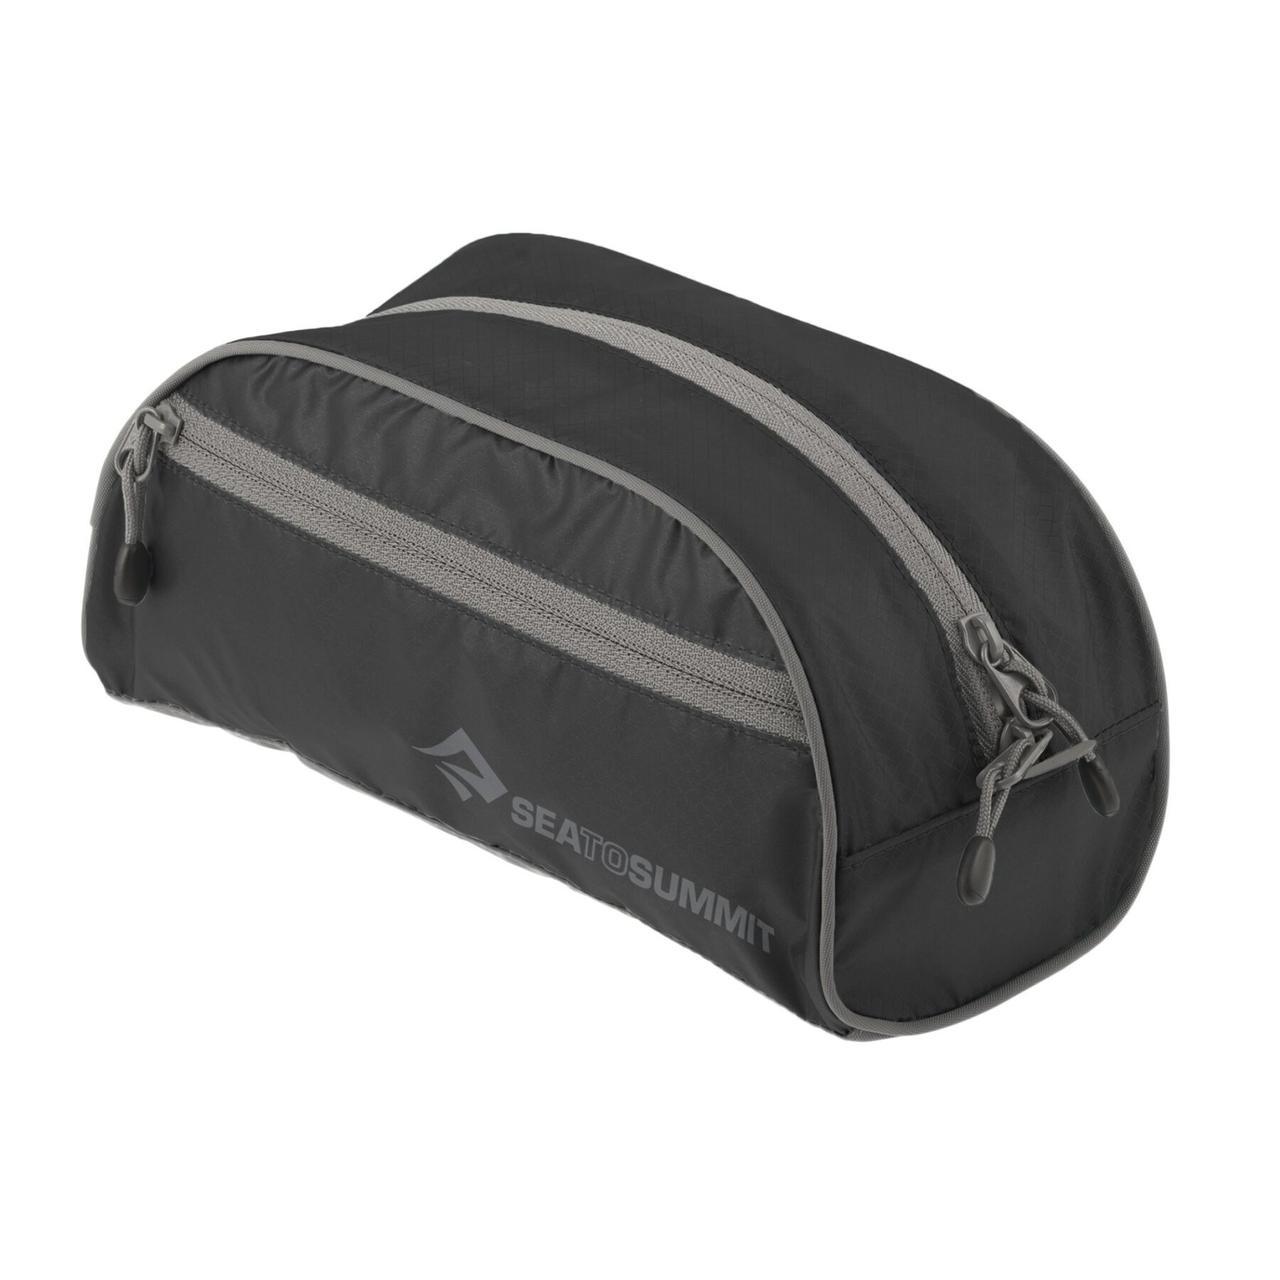 Косметичка Sea To Summit - TL Toiletry Bag Black, 20.3 х 10 х 10 см (STS ATLTBSBK)(Размер 20.3 х 10 х 10 см)